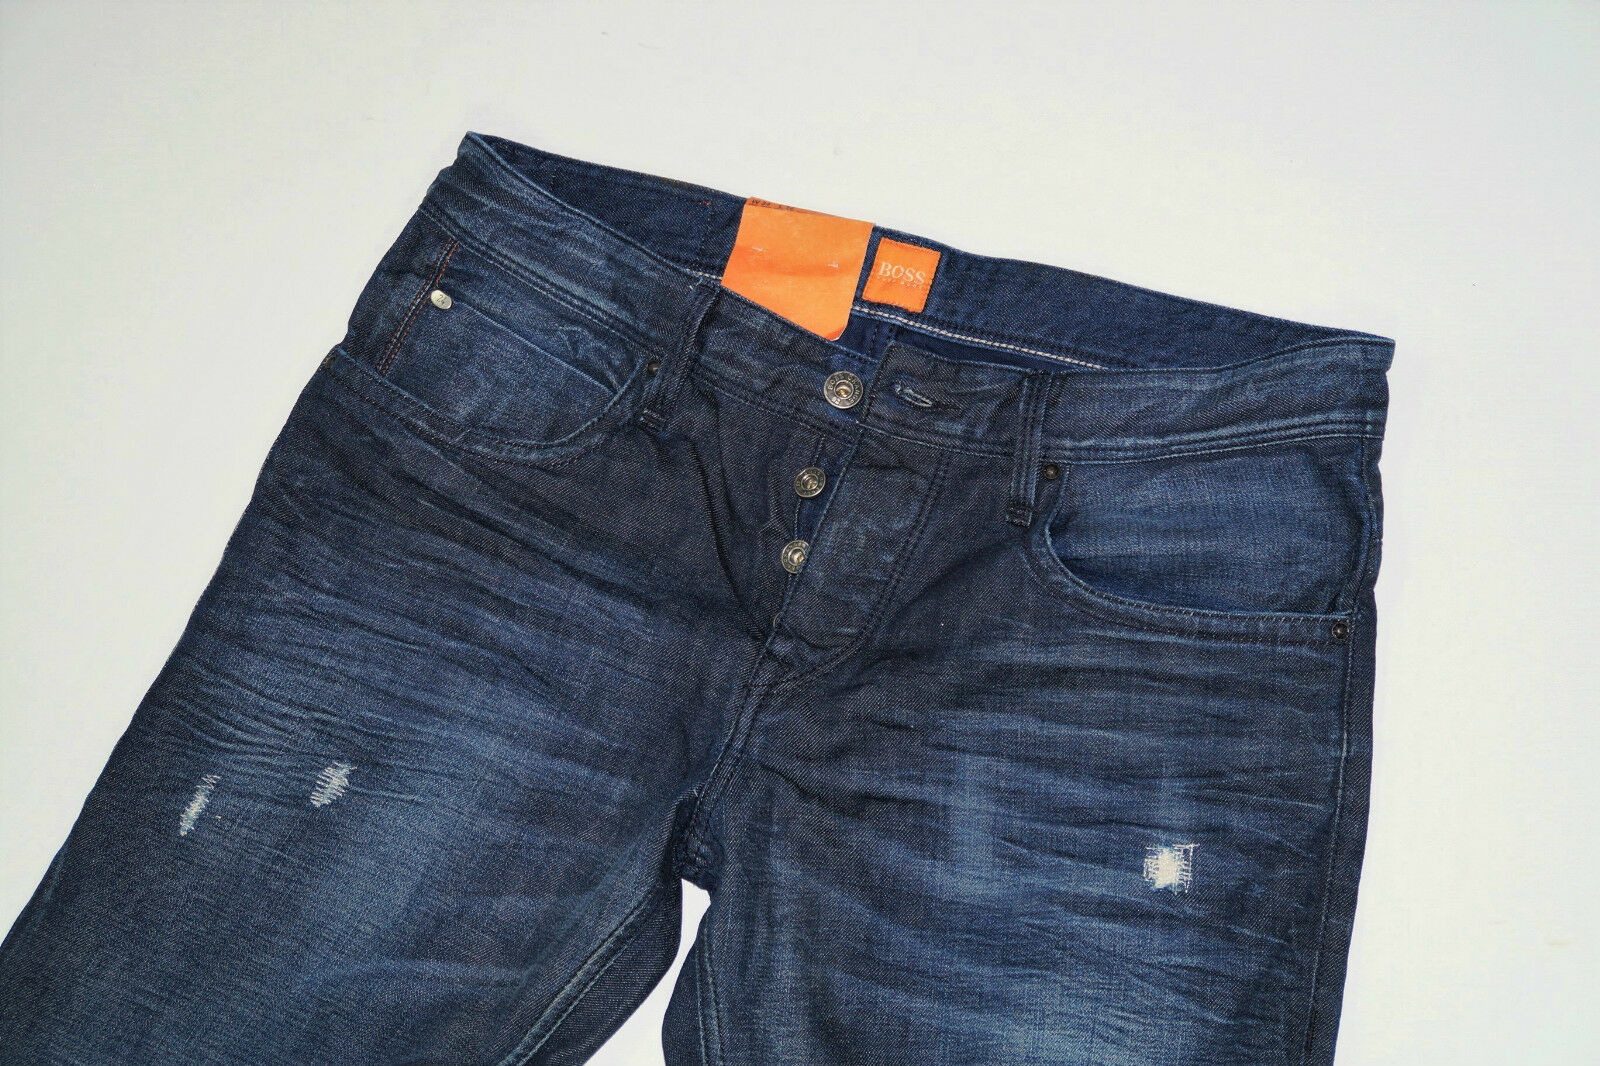 NHugo Boss orange 24 Milano  W33 L36  Used Denim Jeans  Straight Fit  33 36